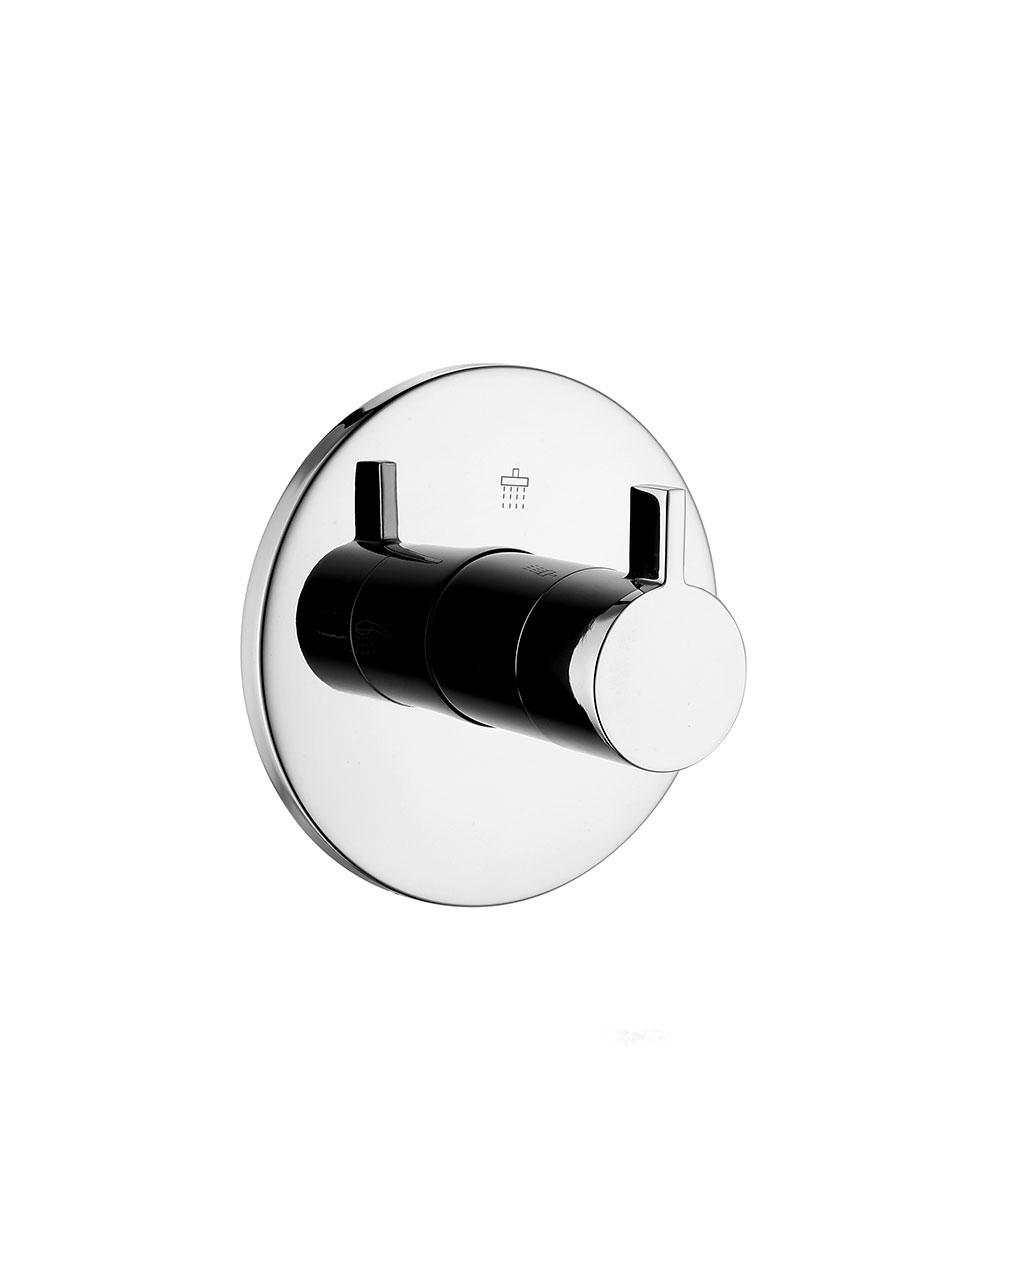 Вентиль Imprese ZAMEK запорный/переключающий (3 потребителя), форма R VR-151031